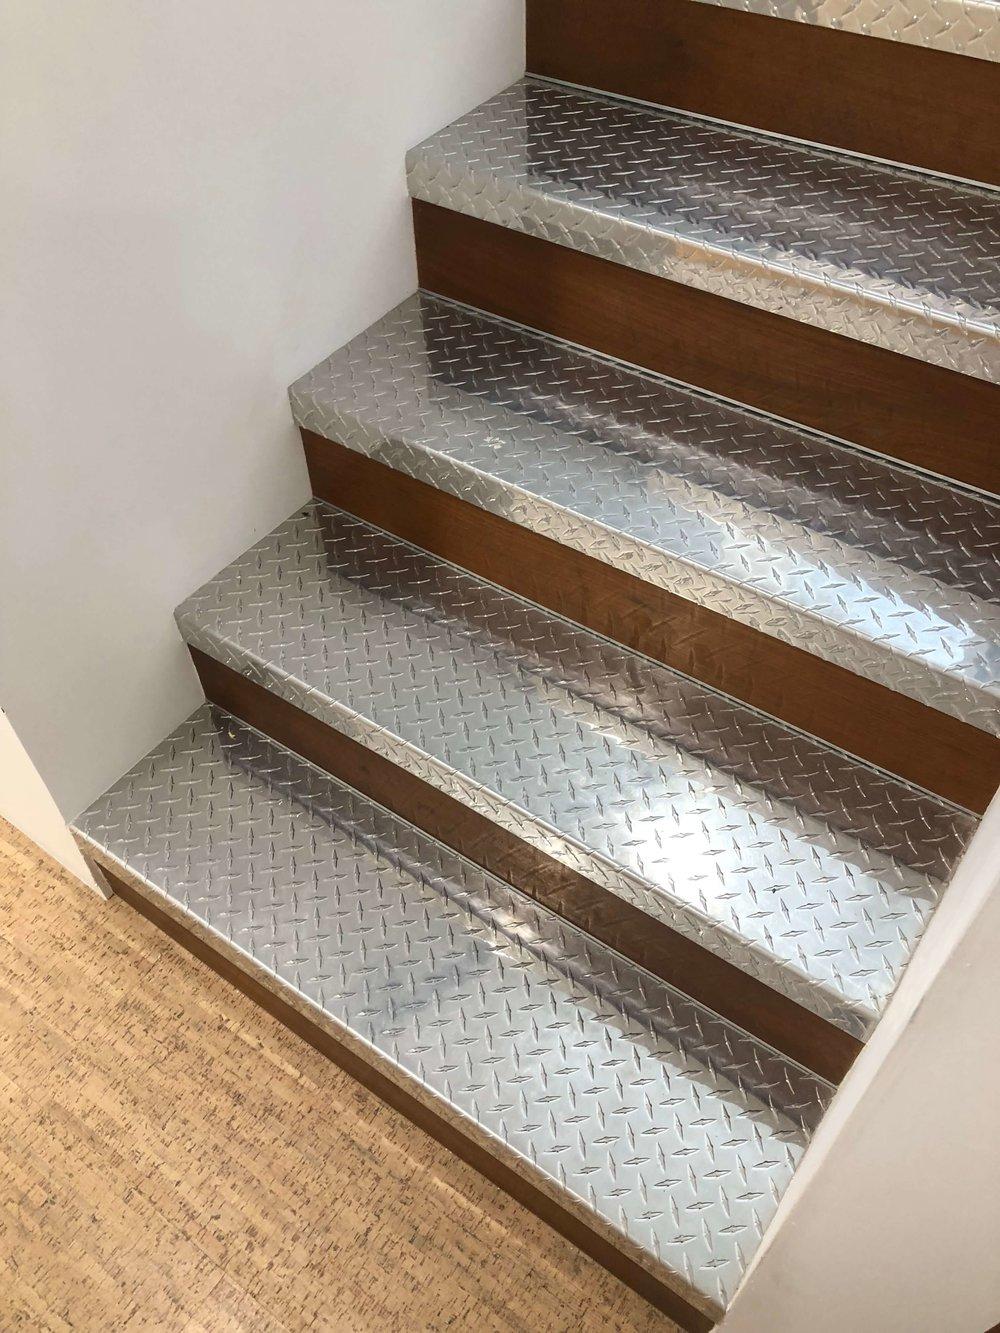 California contemporary design - Dwell on Design's Fall Home Tour, Designer: Vitus Mitare #contemporaryarchitecture #stairs #corkfloor